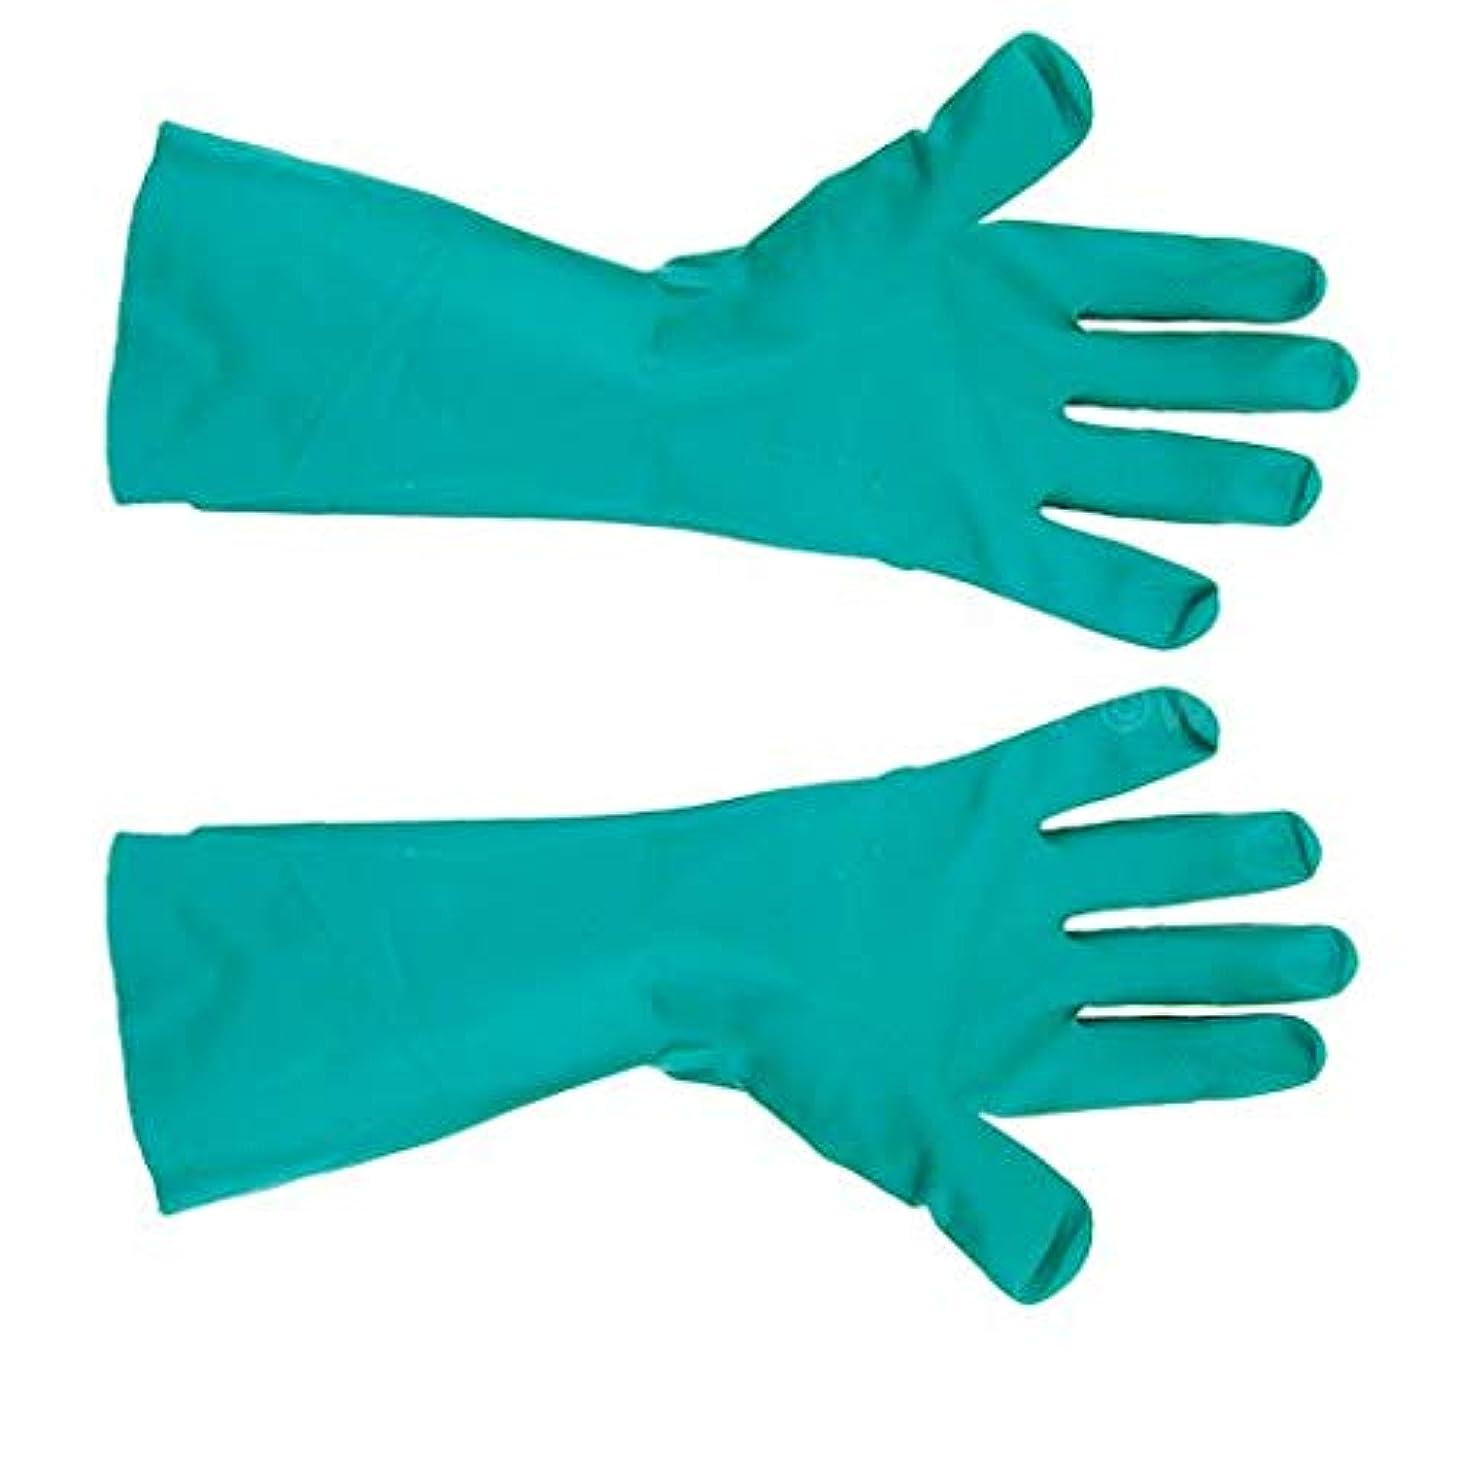 Chemical Resistant Gloves, Medium (60 Pairs)